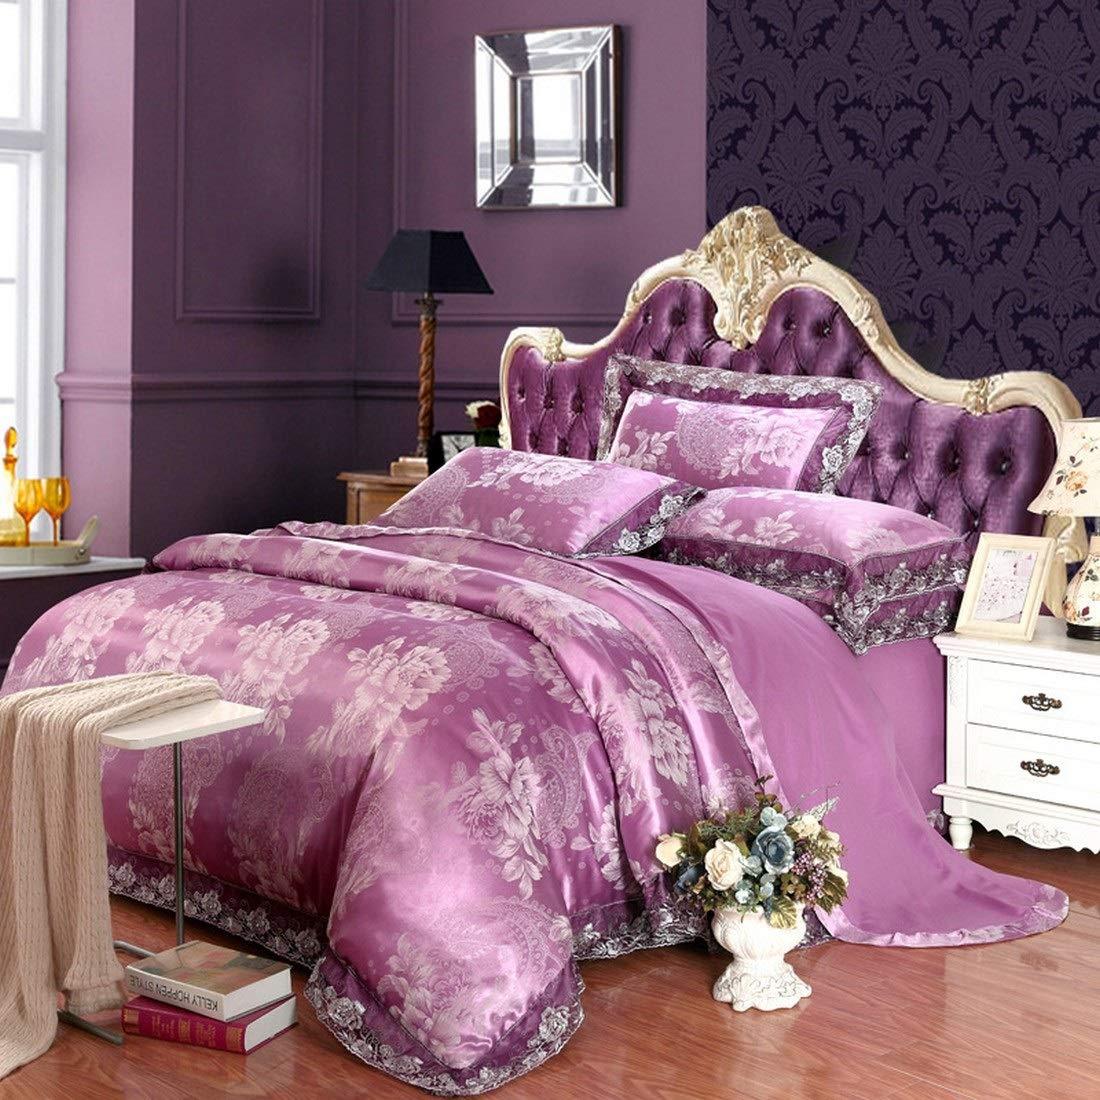 Koloeplf シンプルな新しいモーダルサテンジャガードコットンレース寝具セット (Color : Purple, Size : QUEEN) B07P1XQ8LH Purple Queen